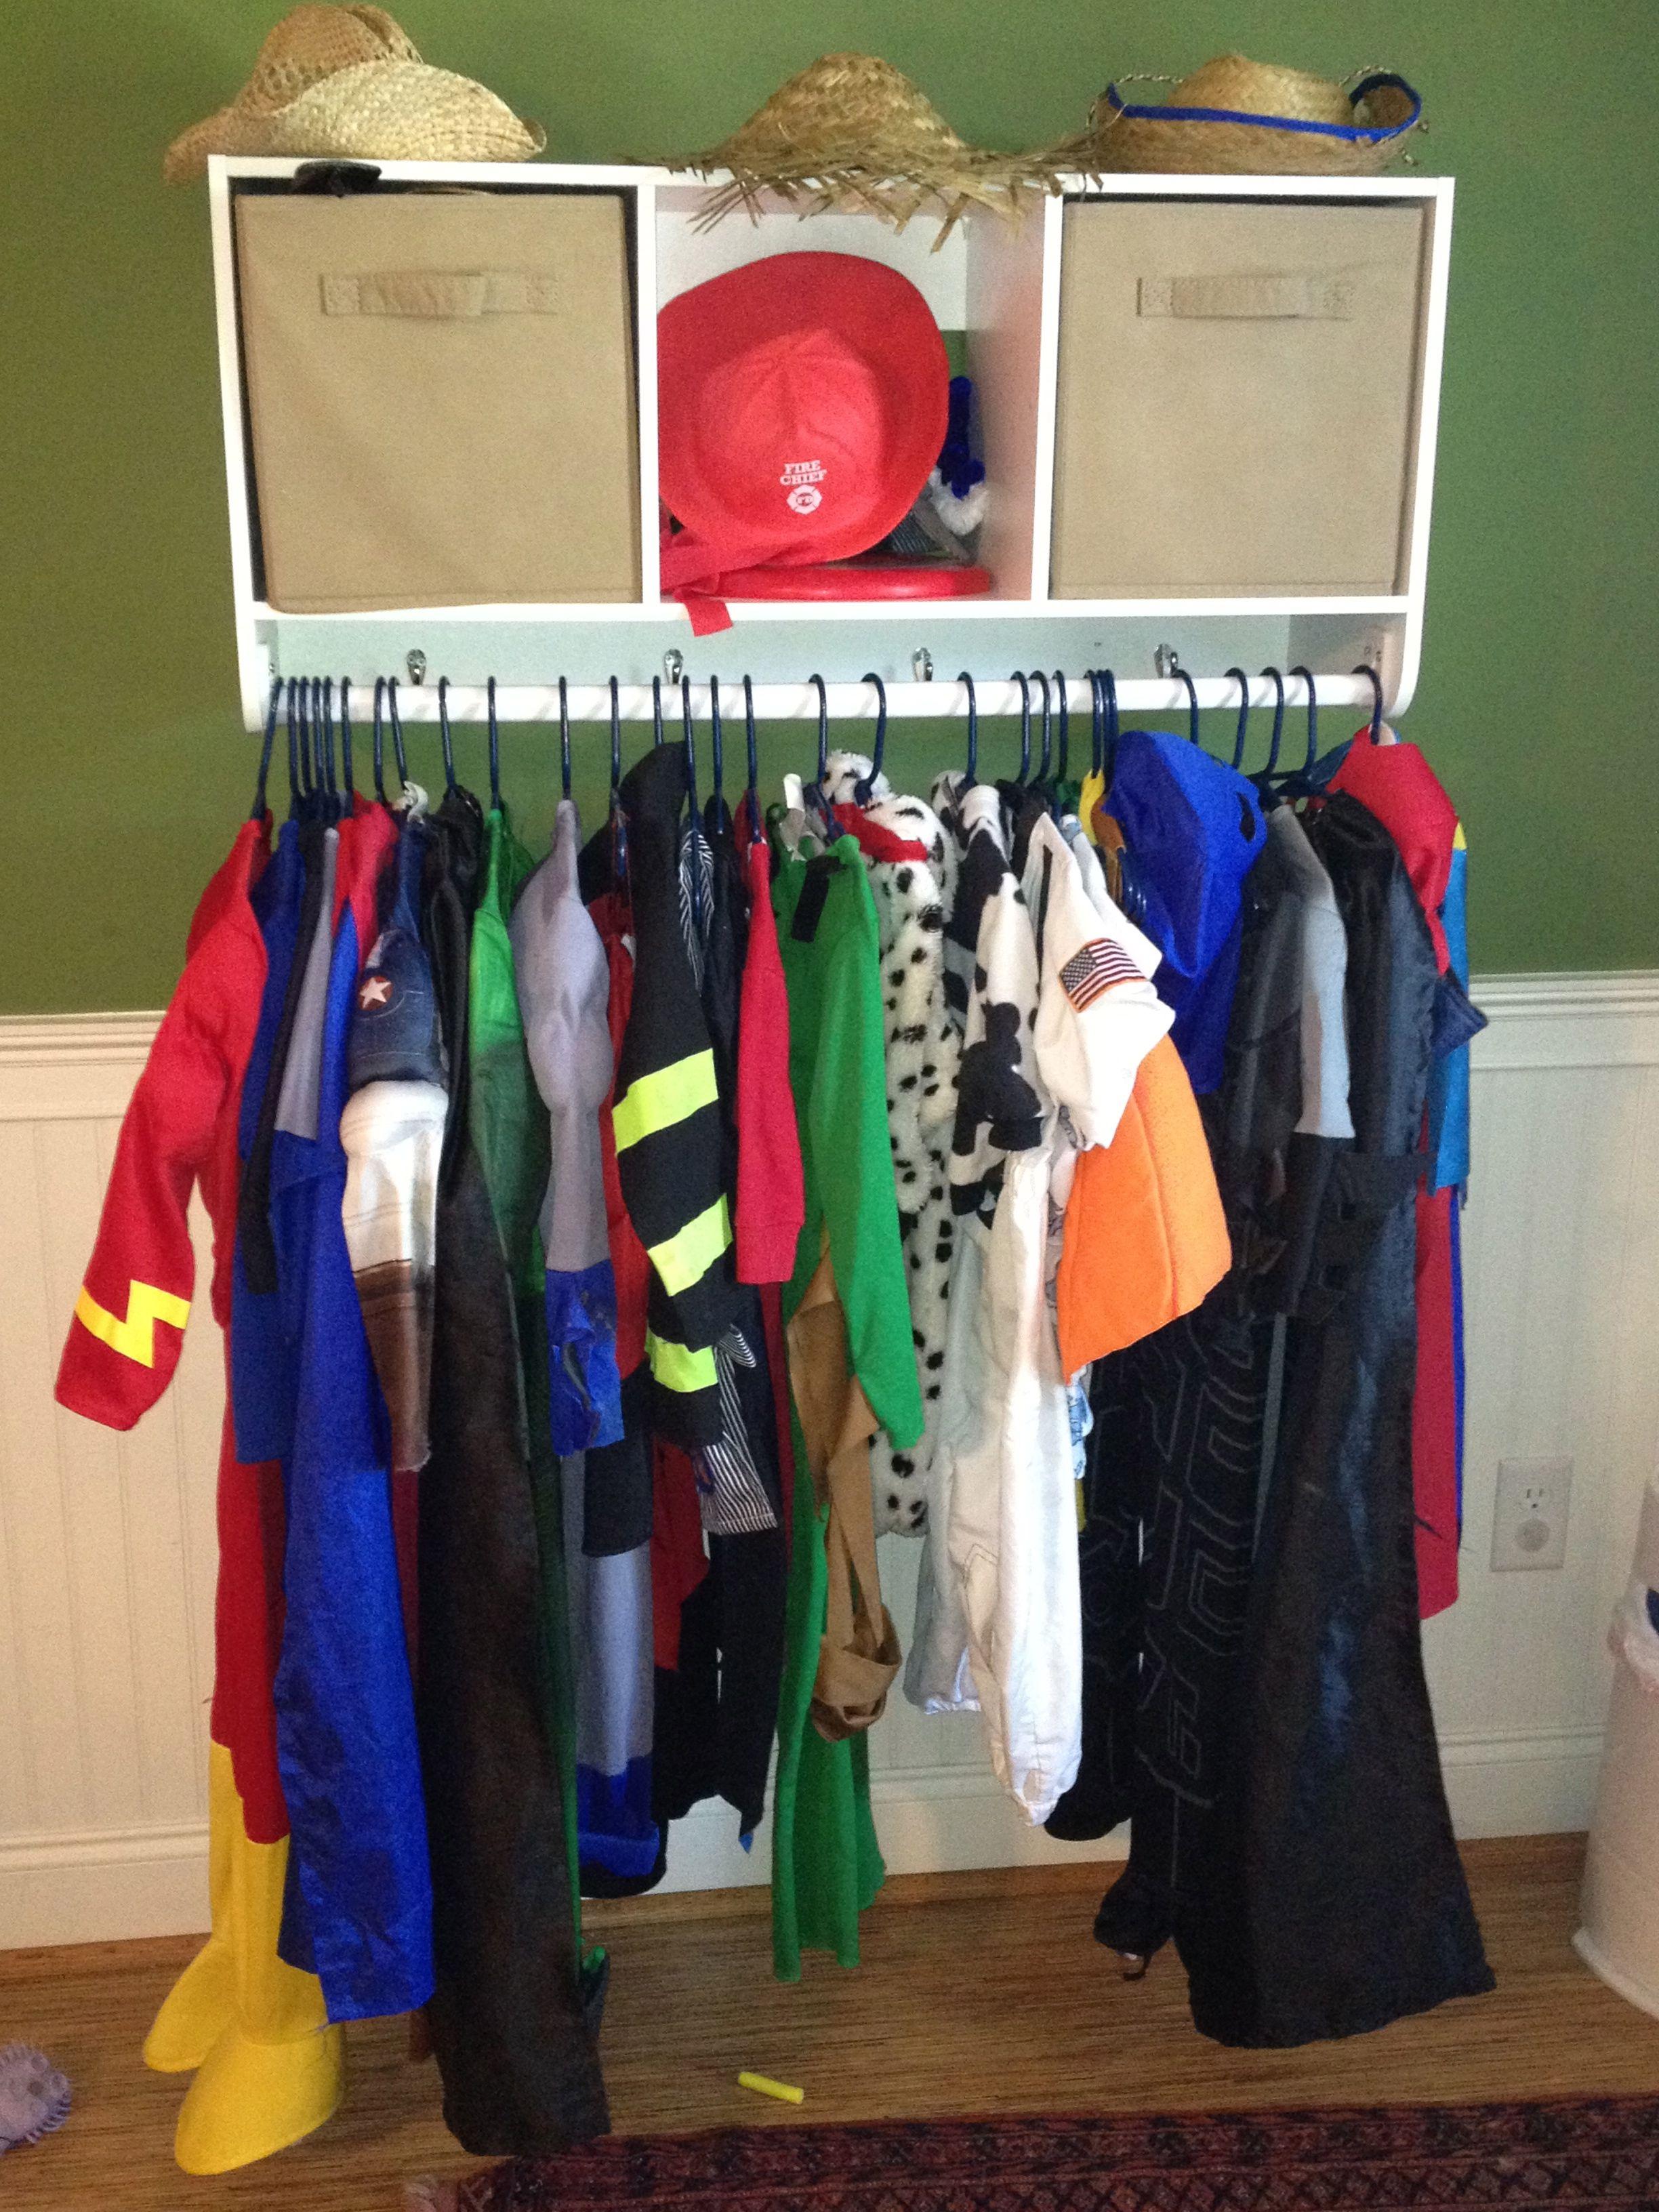 costume storage martha stewart wall unit model 4937 with closetmaid closet rod model 7042. Black Bedroom Furniture Sets. Home Design Ideas